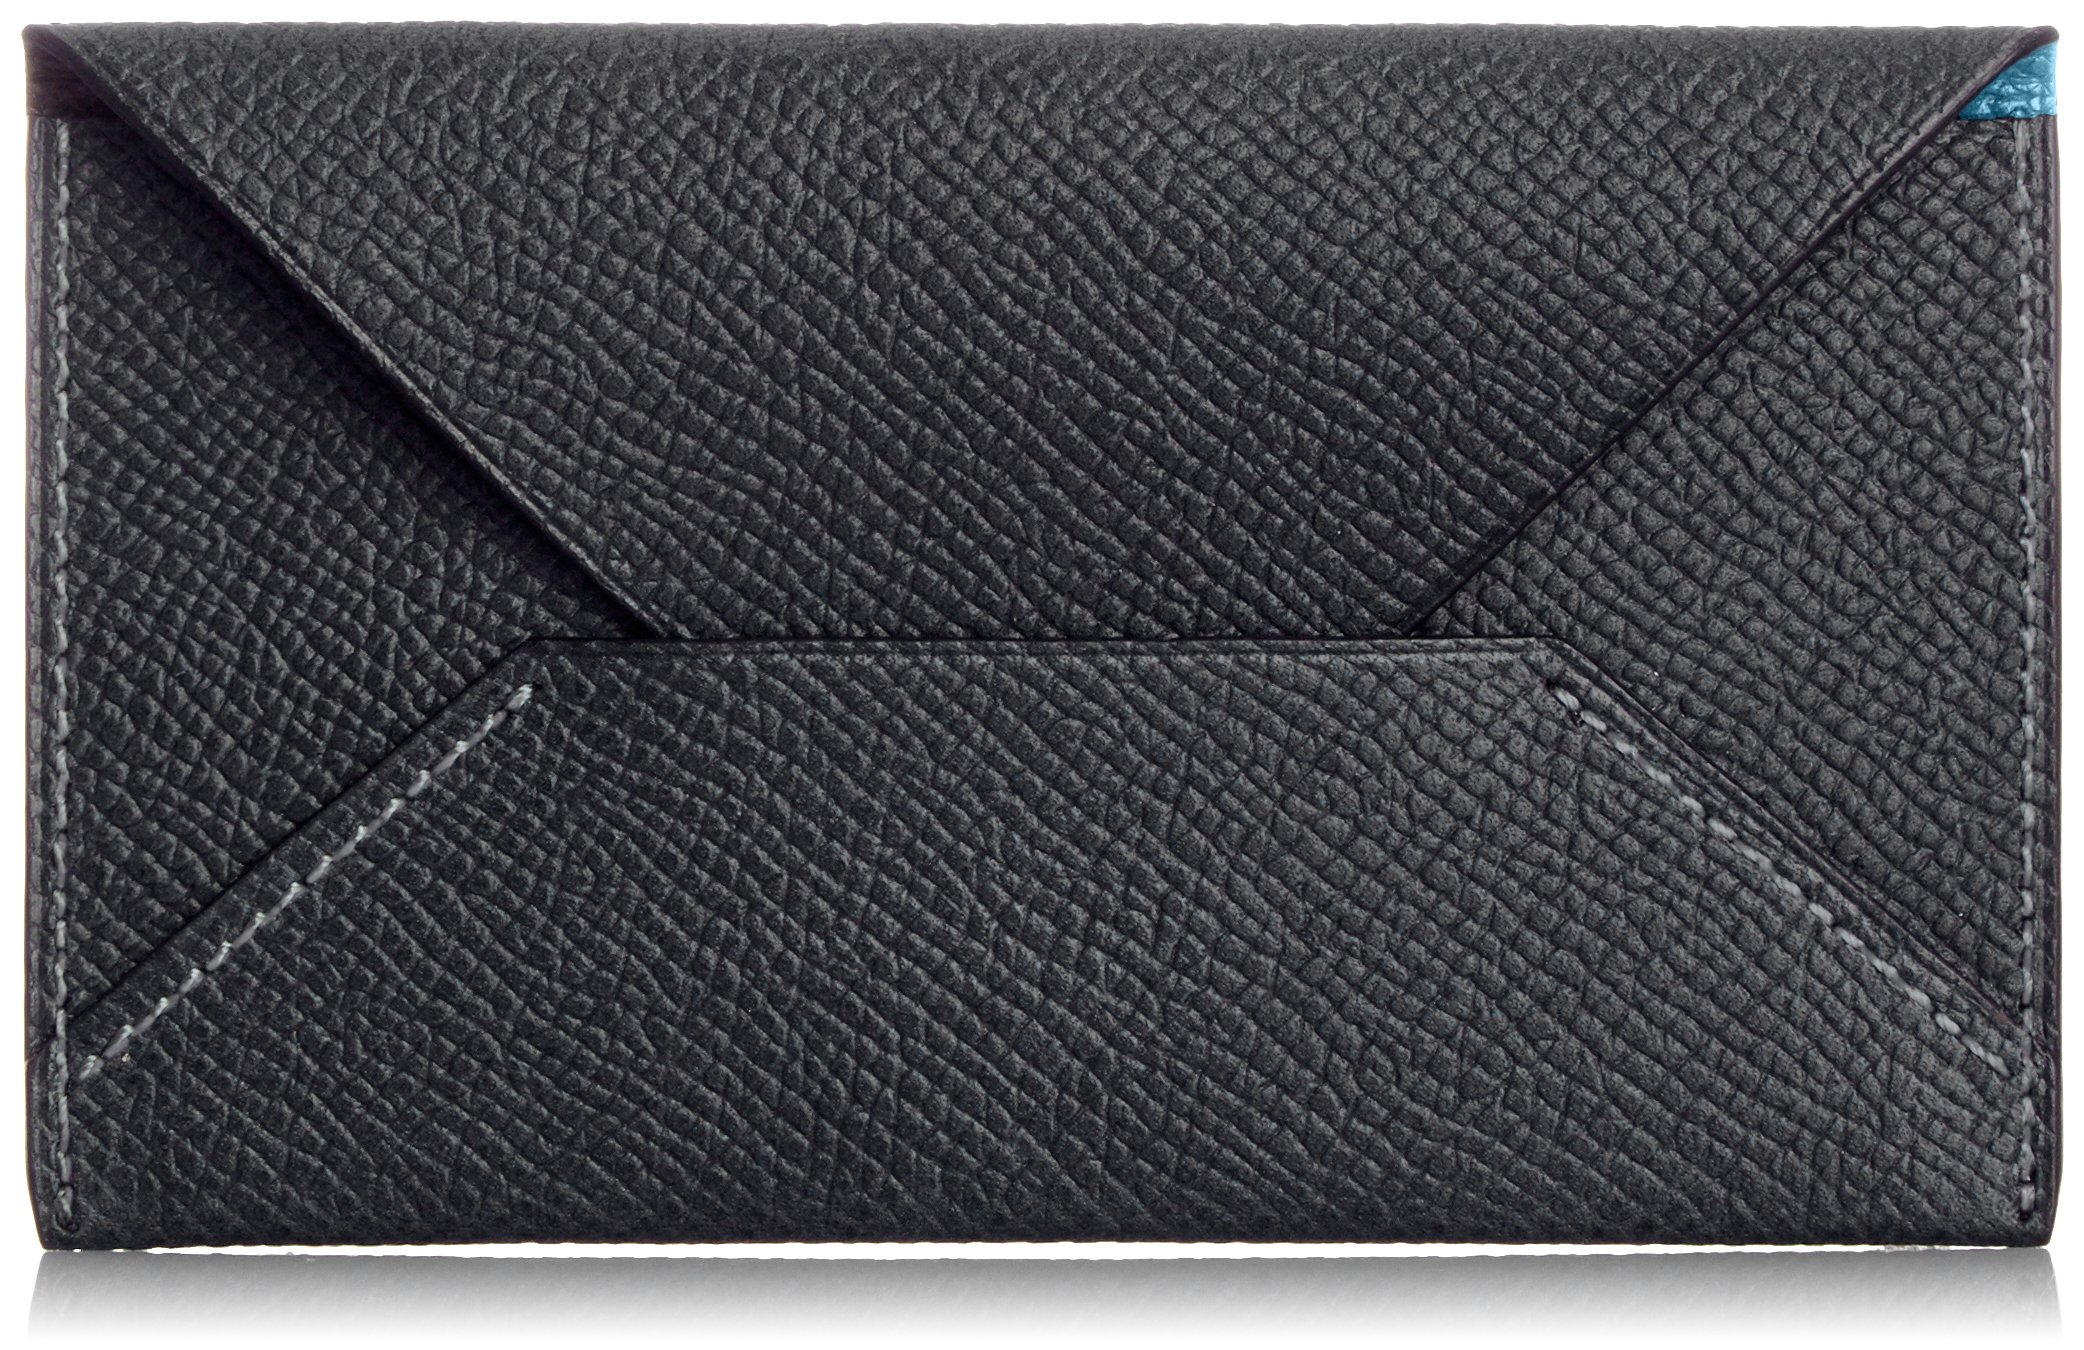 MAISON de HIROAN Leather Business card case Made in Japan 21556 Black/Blue